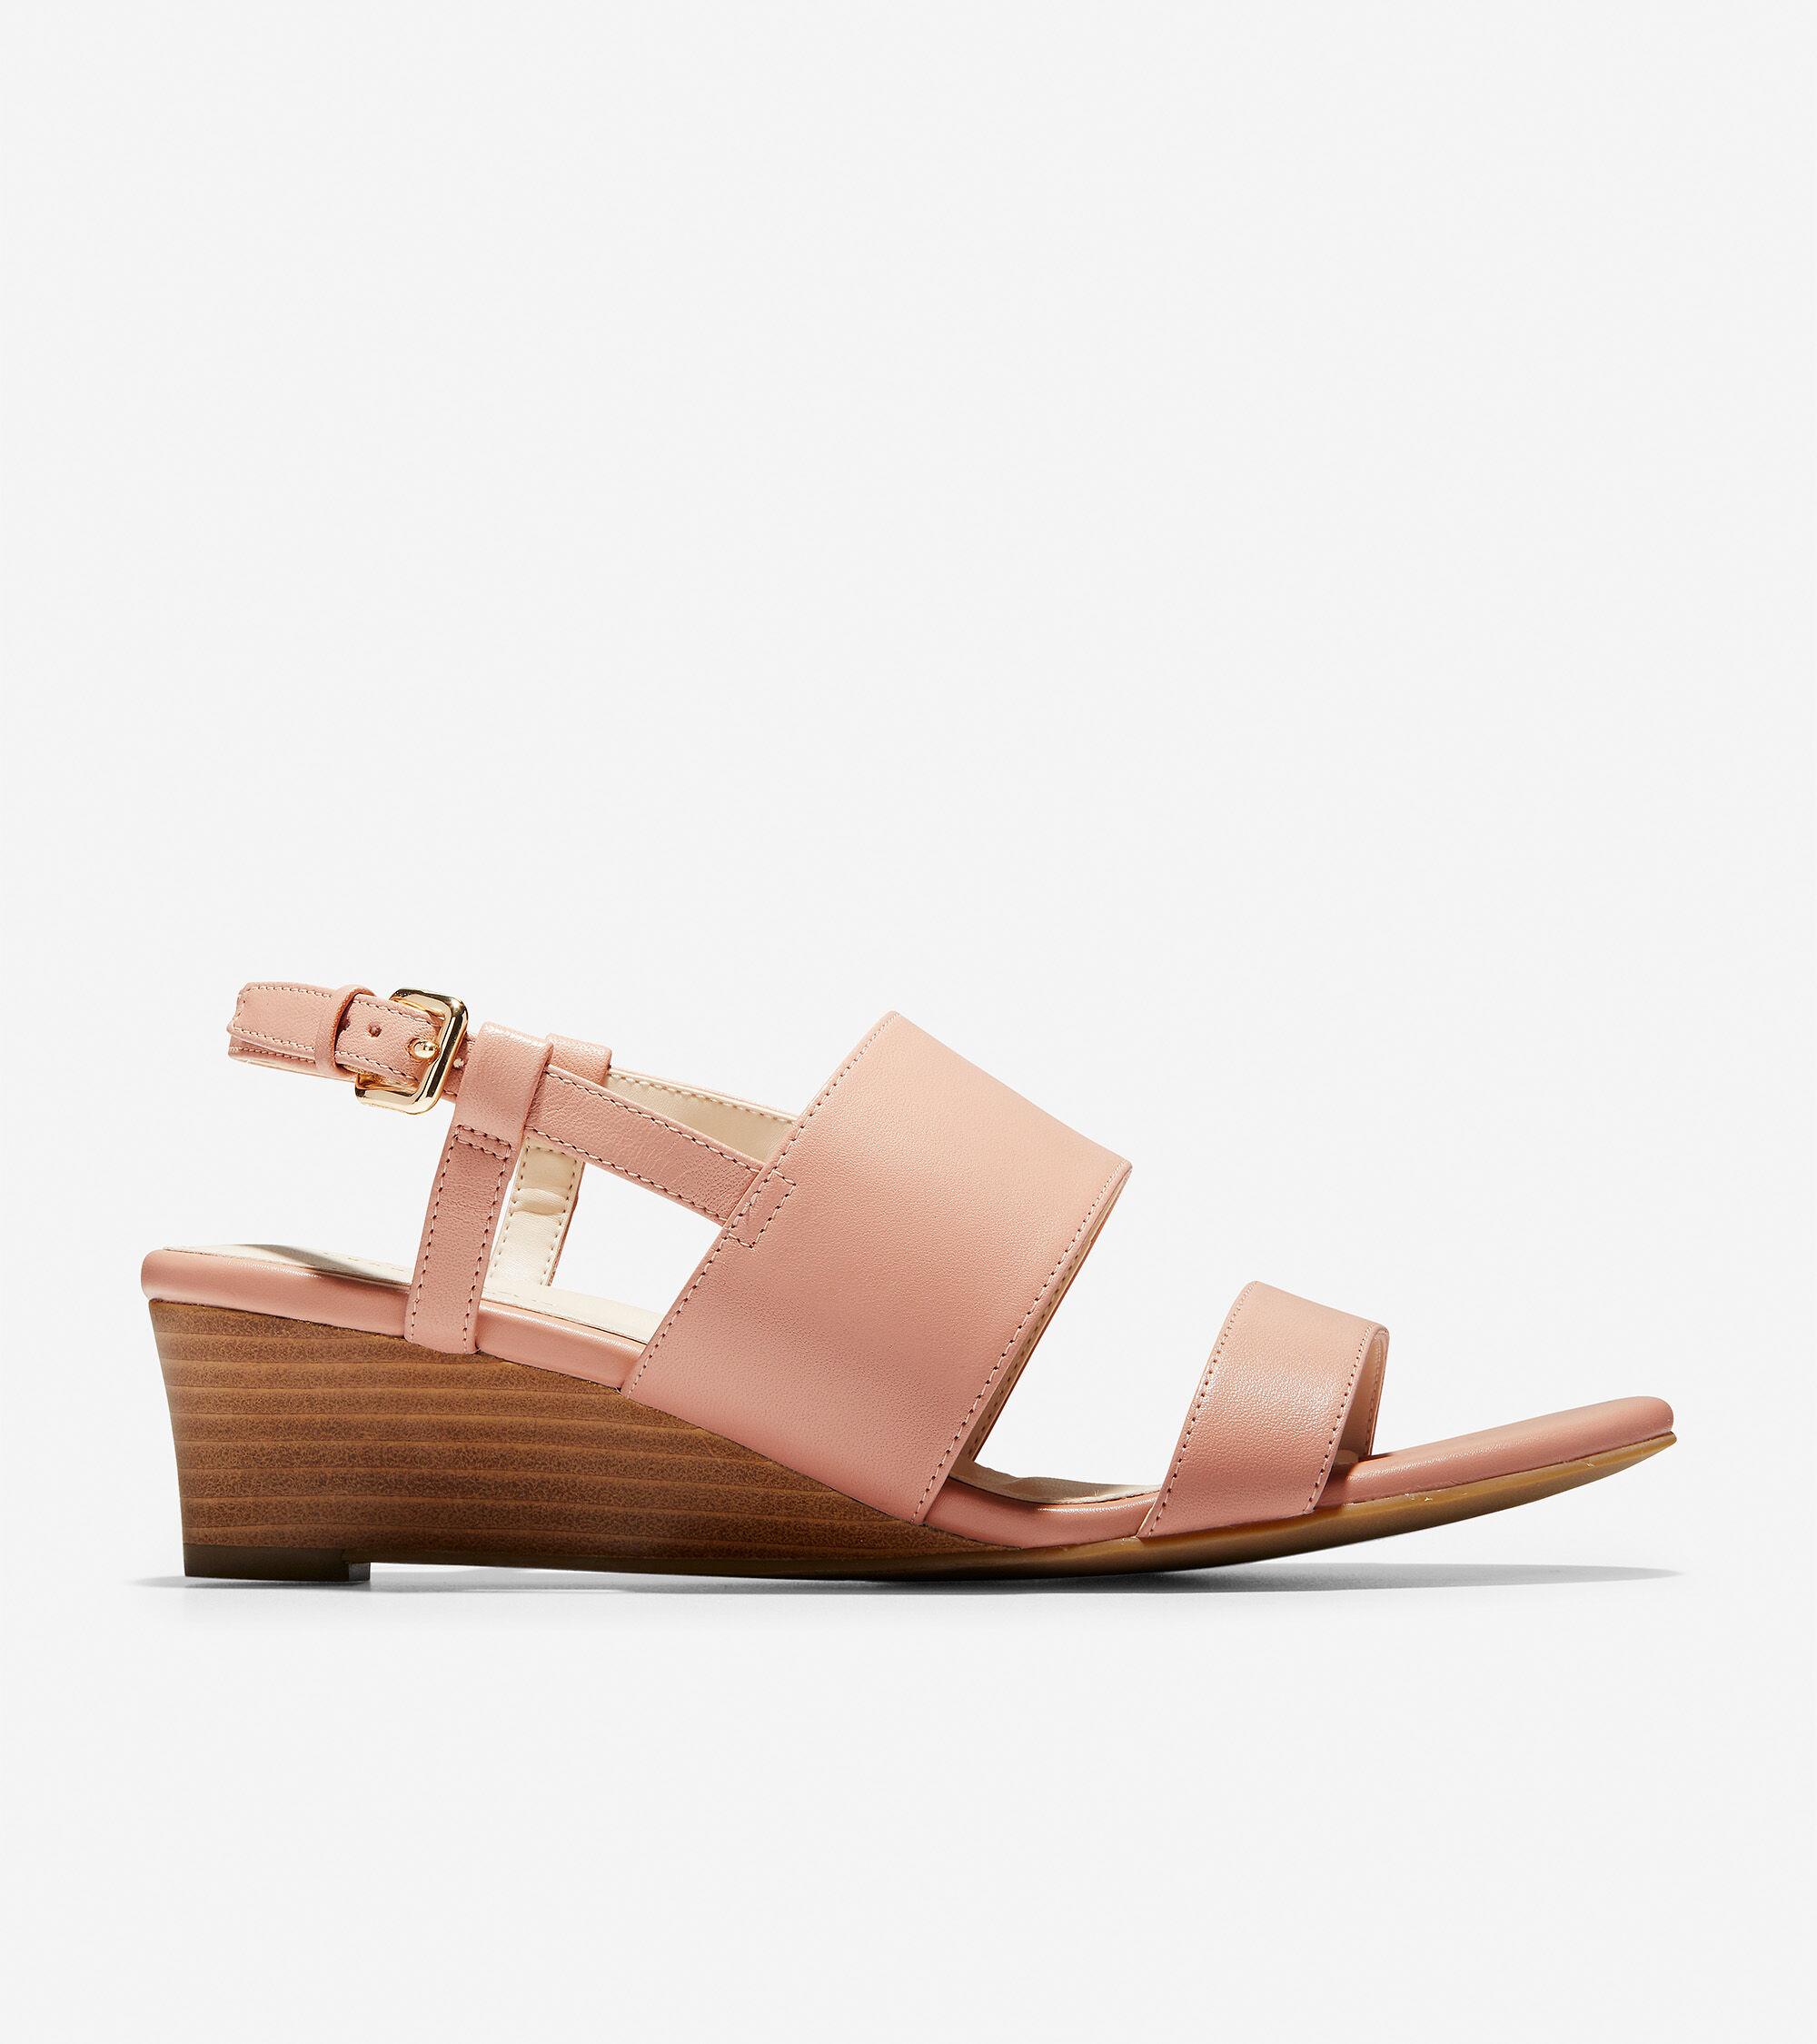 Cole Haan Women's Annabel Grand Wedge Sandal